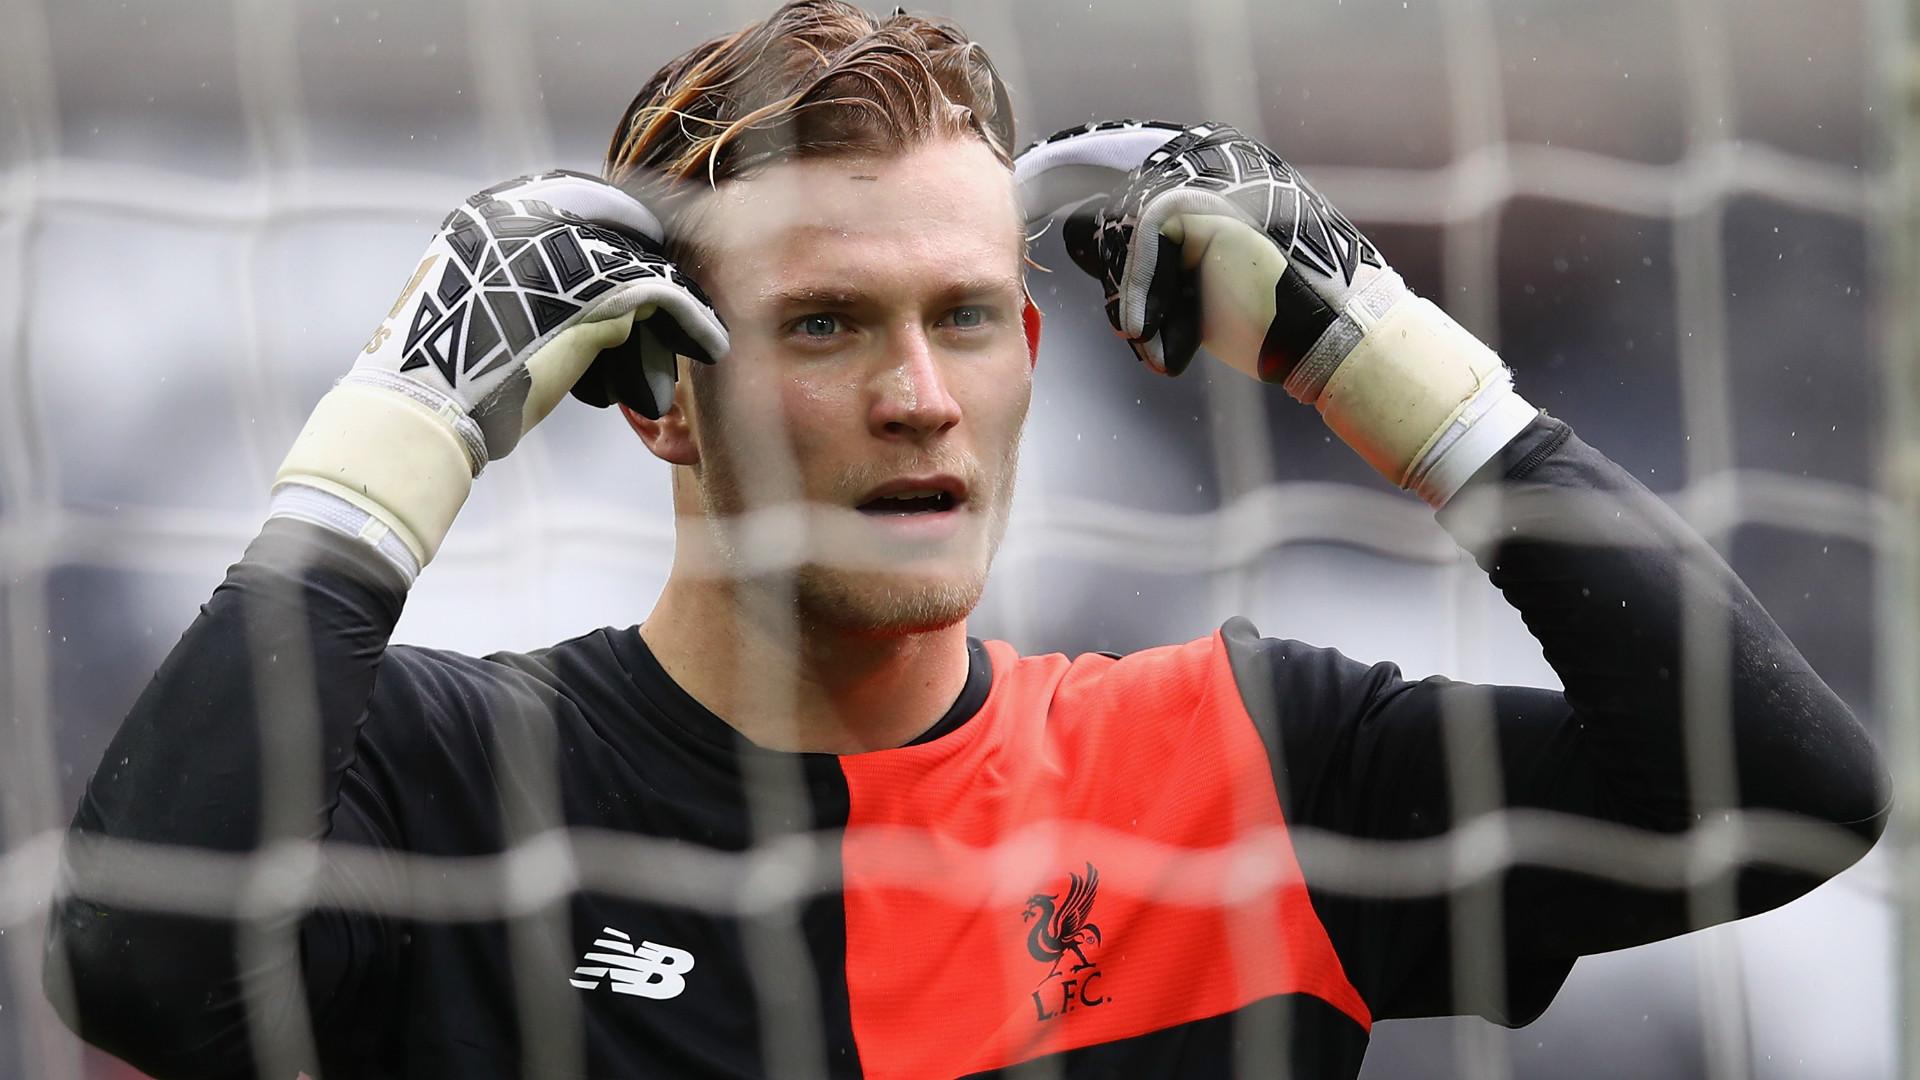 HD Loris Karius Liverpool goalkeeper